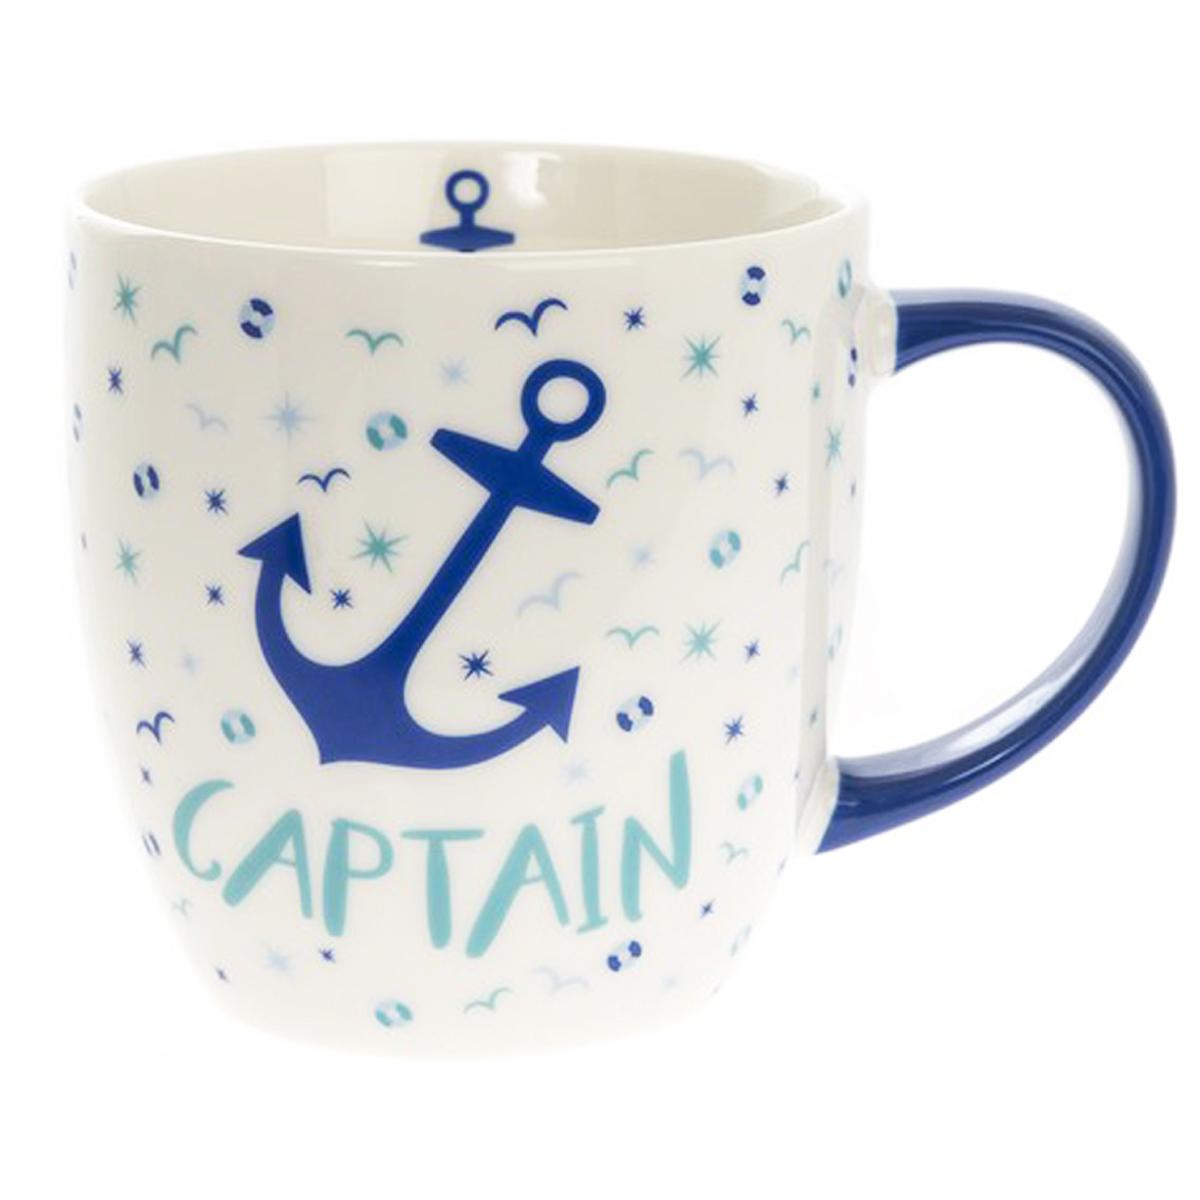 Mug porcelaine \'Captain\' blanc bleu (ancre marine) - 95x90 mm - [Q2789]